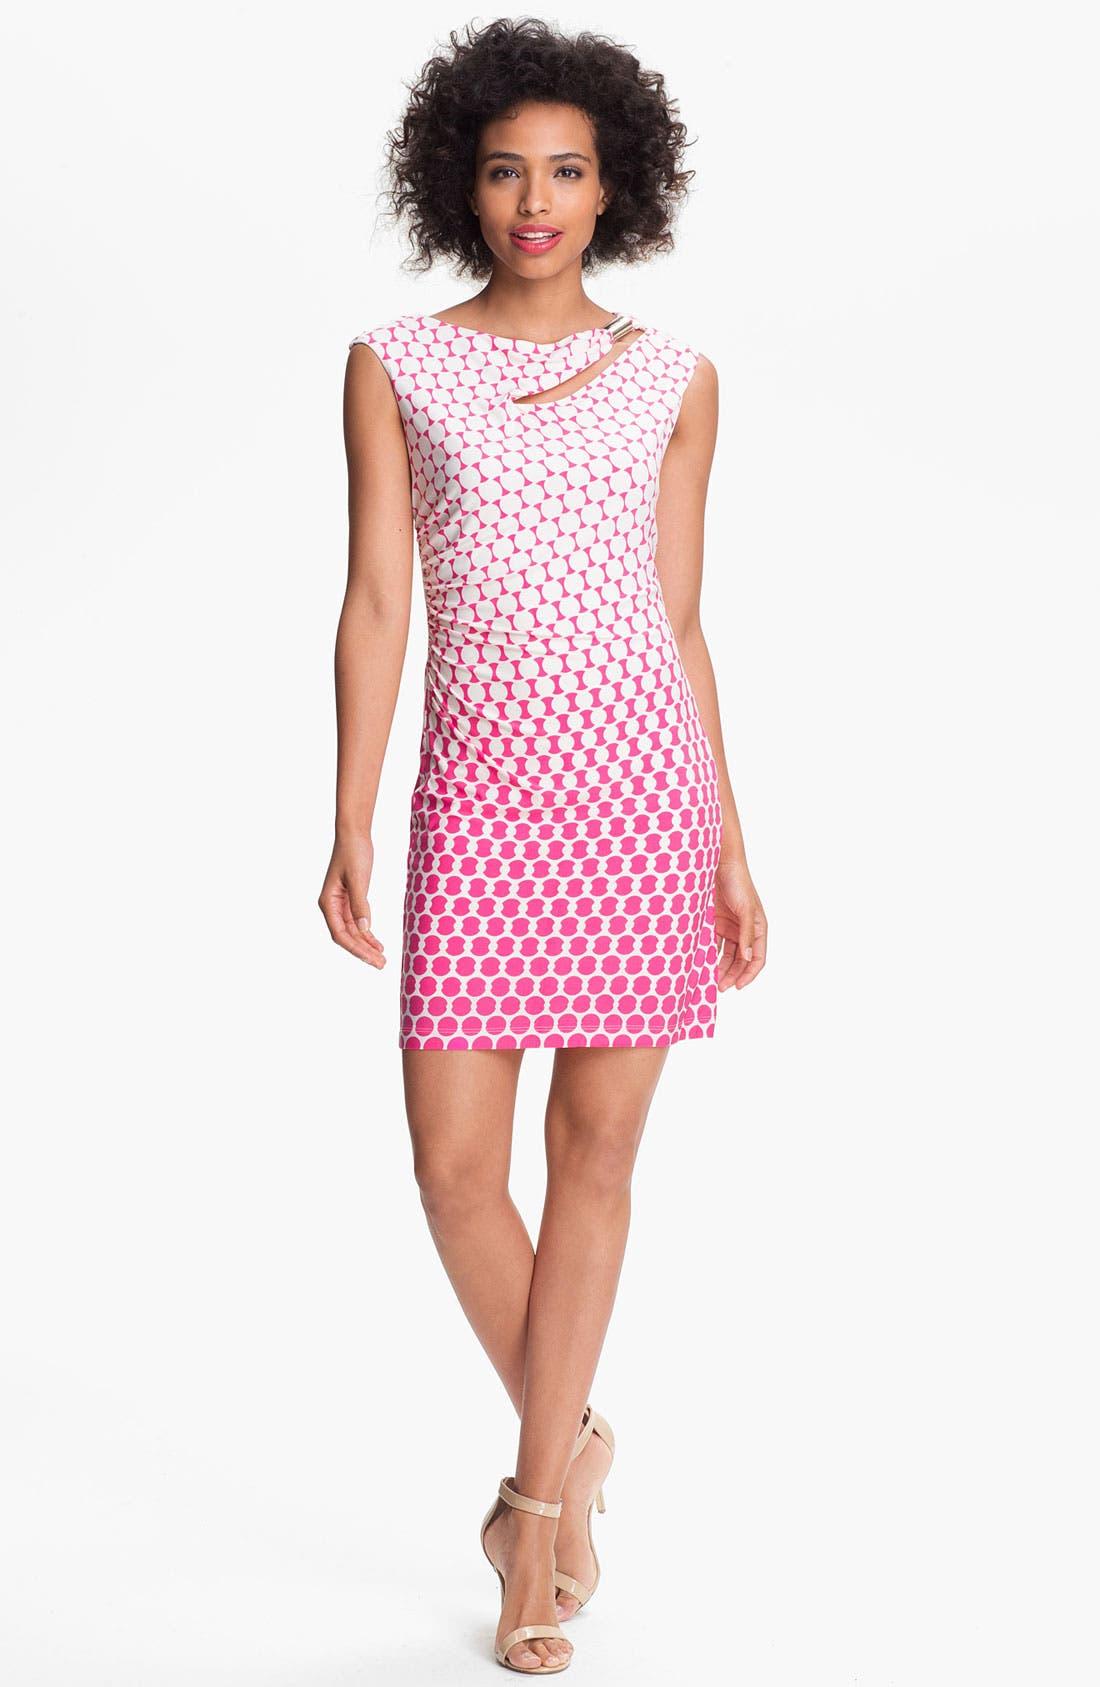 Alternate Image 1 Selected - Donna Morgan 'Maddison' Embellished Print Sheath Dress